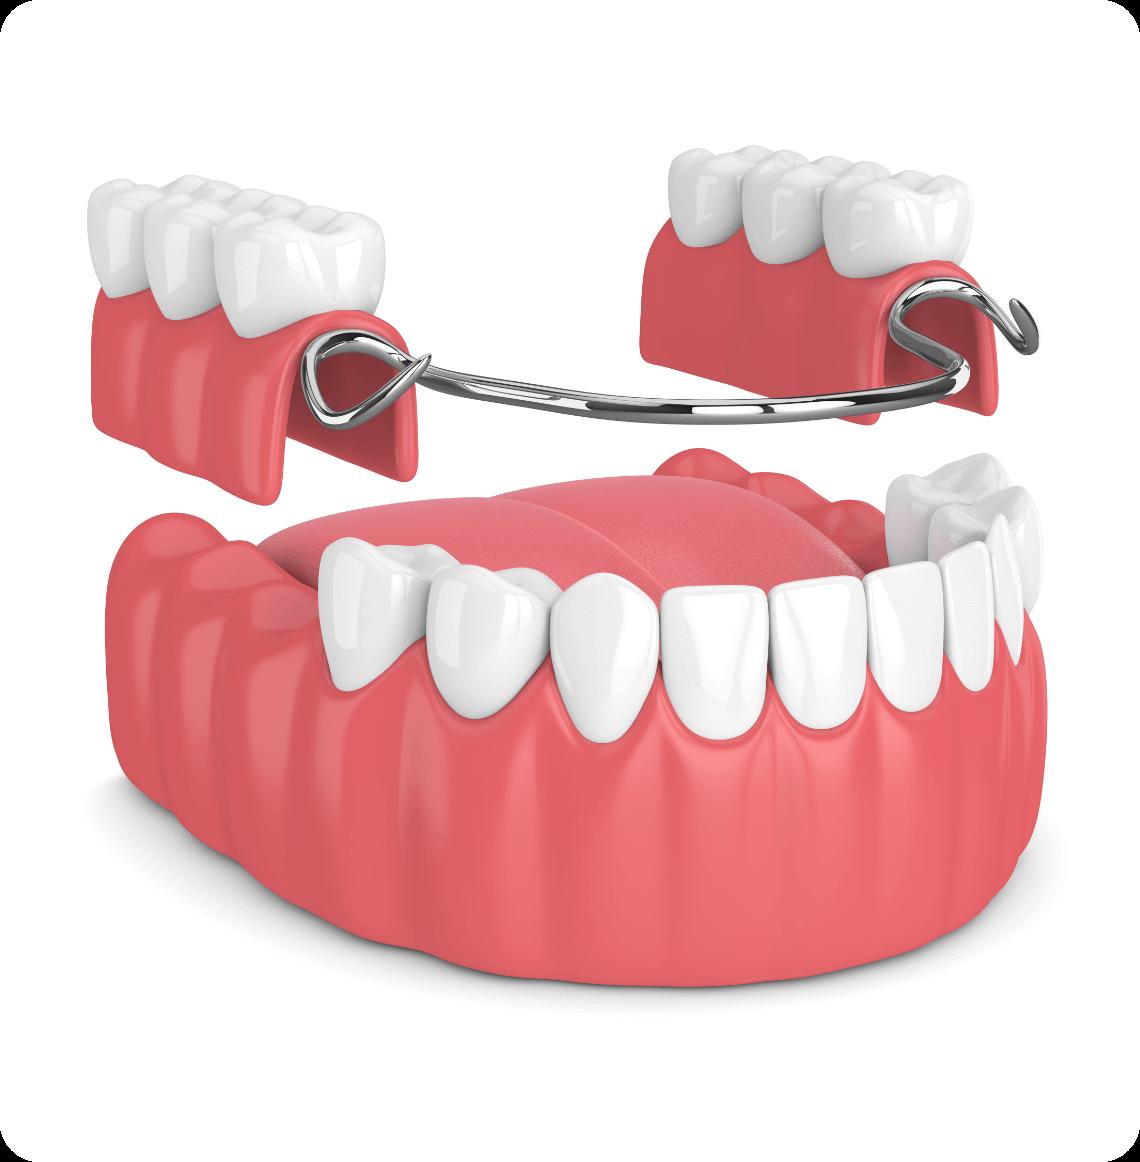 Removable Partial Dentures -